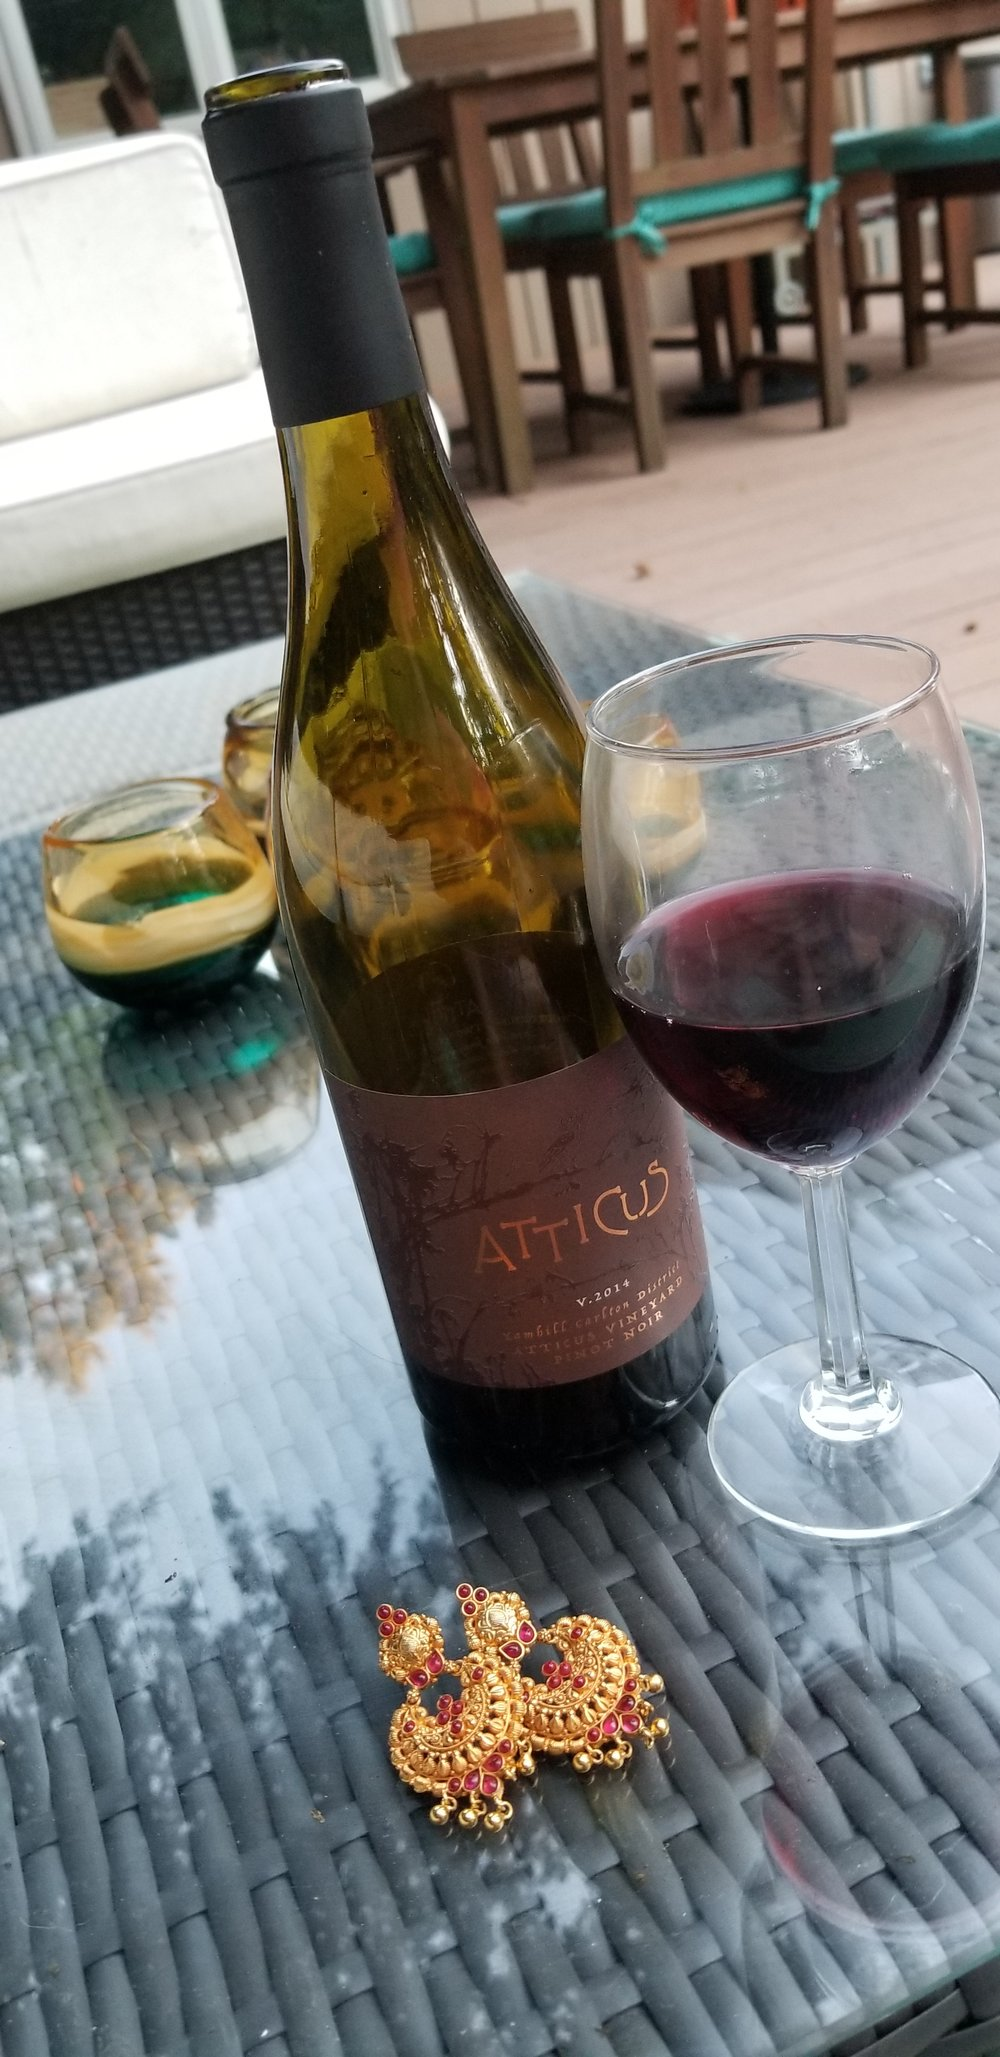 Atticus Pinot Noir